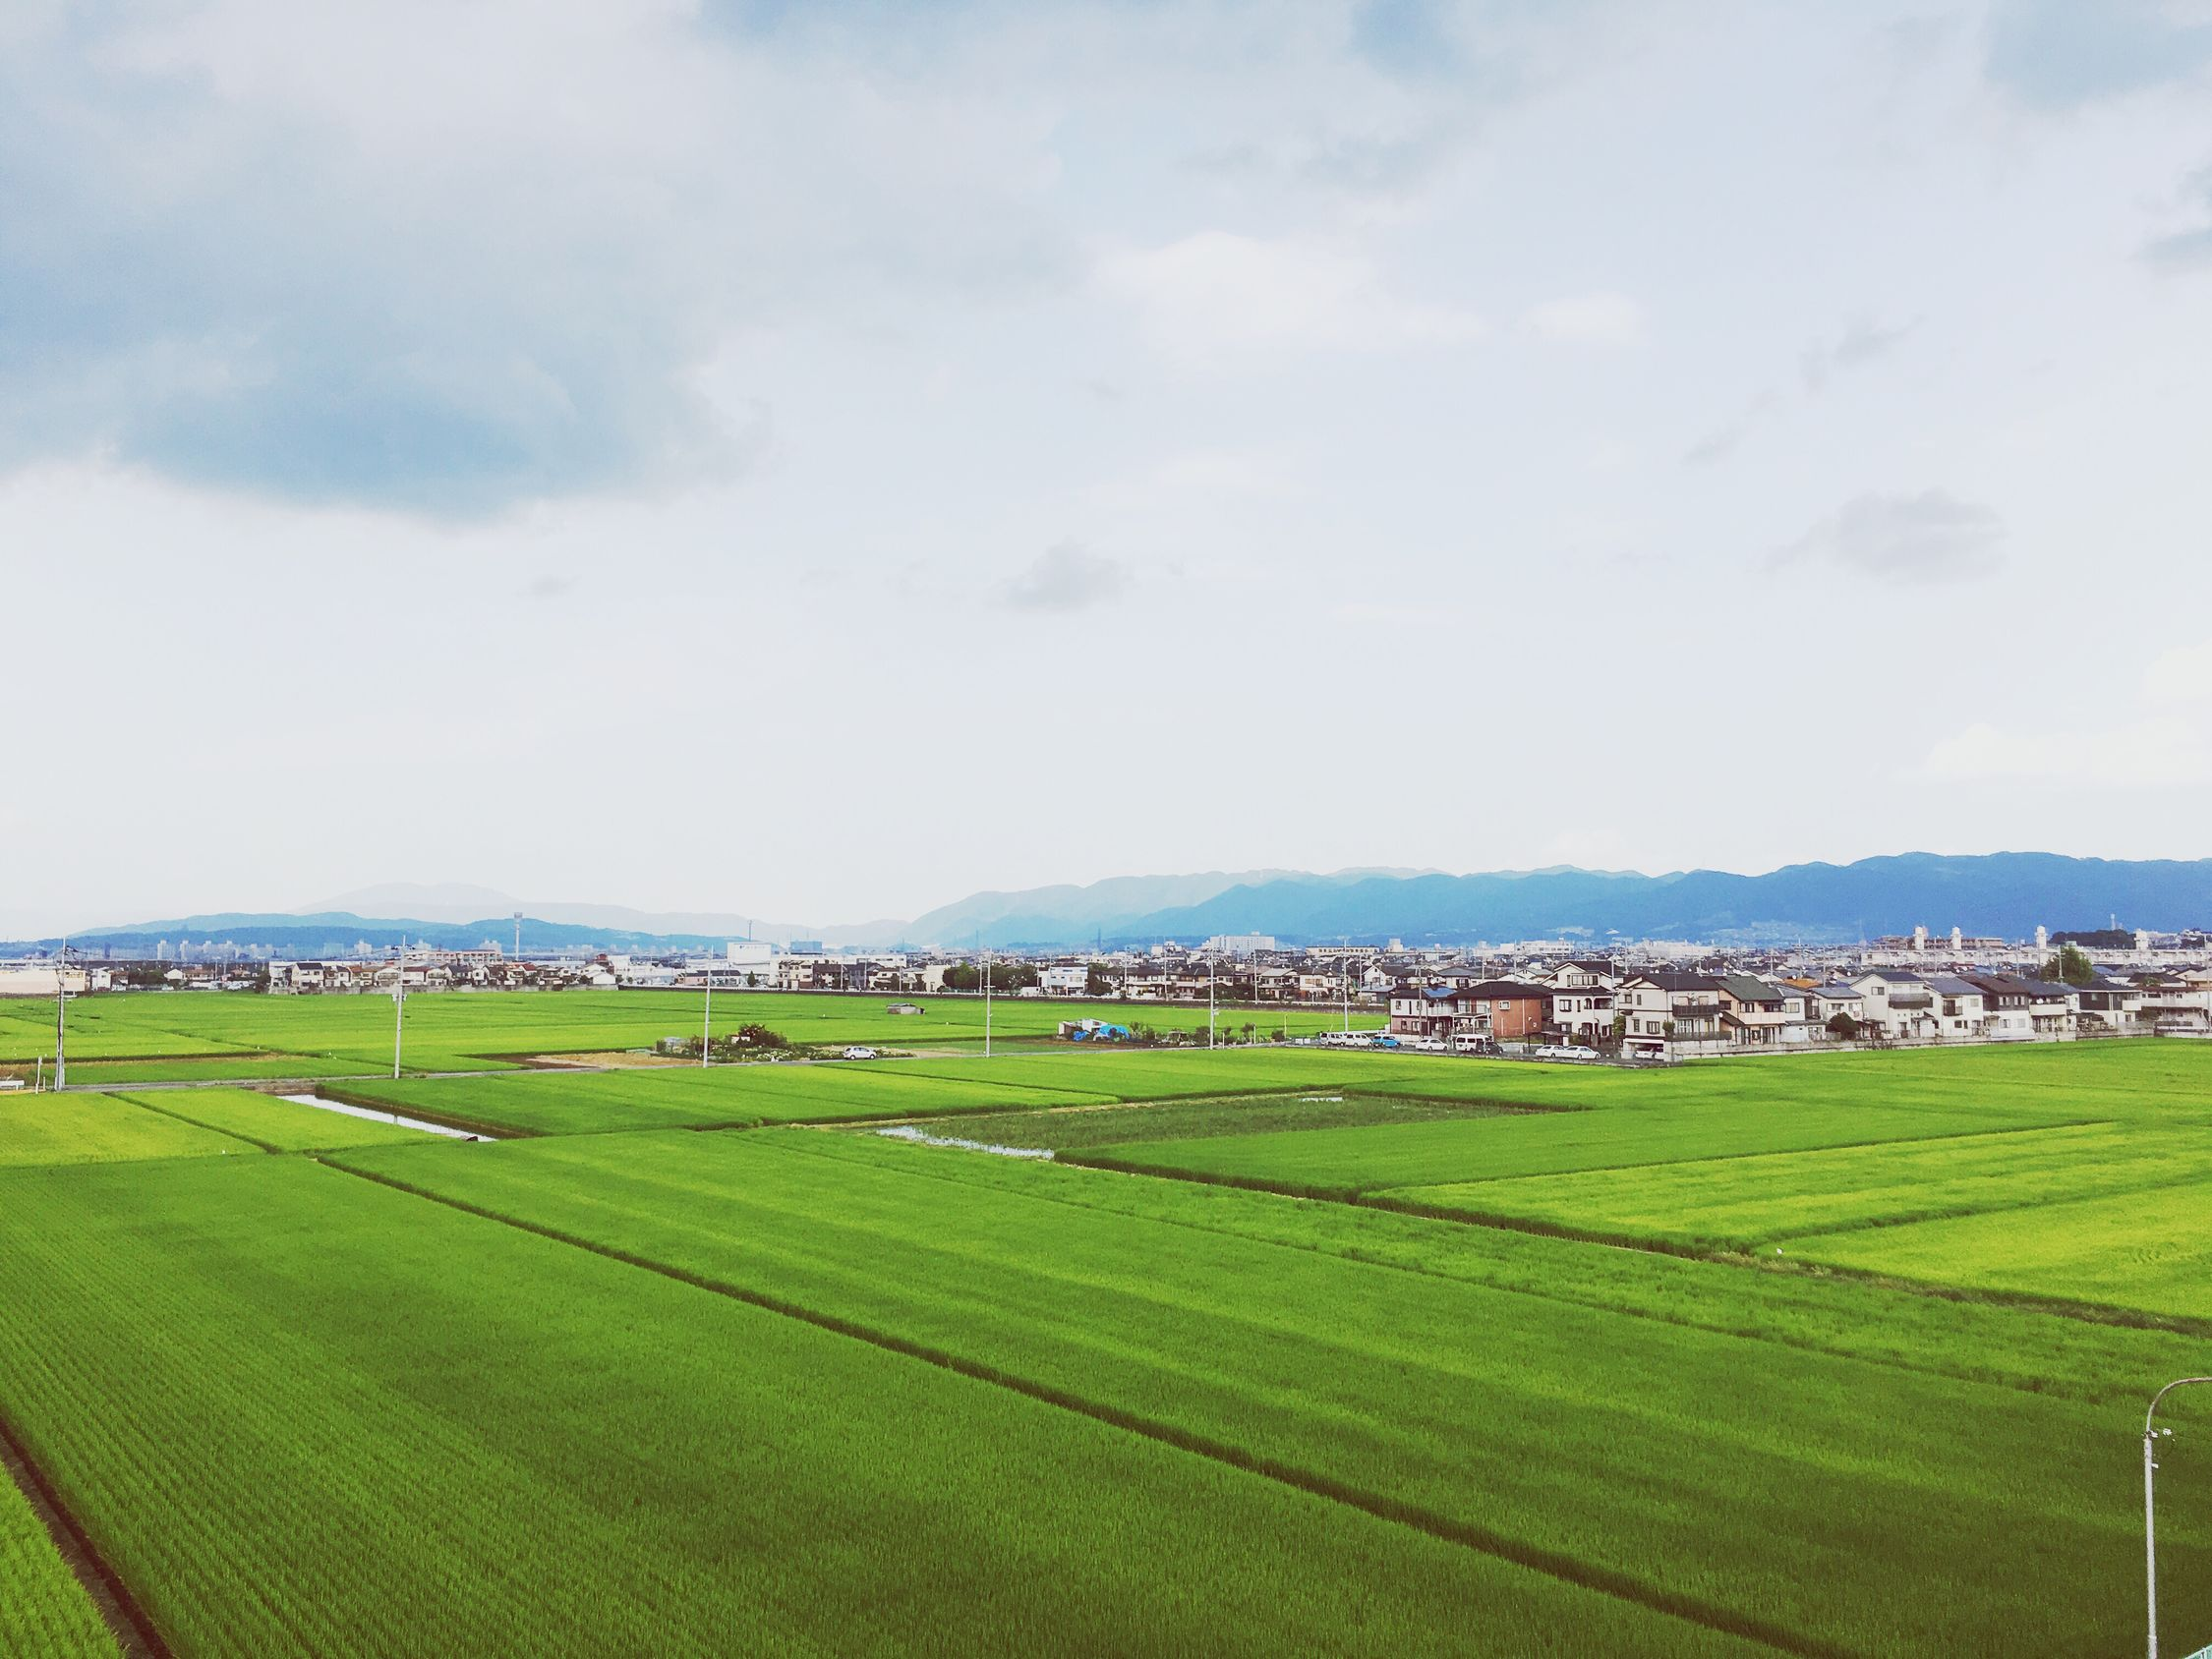 Coolgreen Nativeplace💗 Kyoto Japan Summer Rice Field Cool Green Relaxing Enjoying Life Summervacation